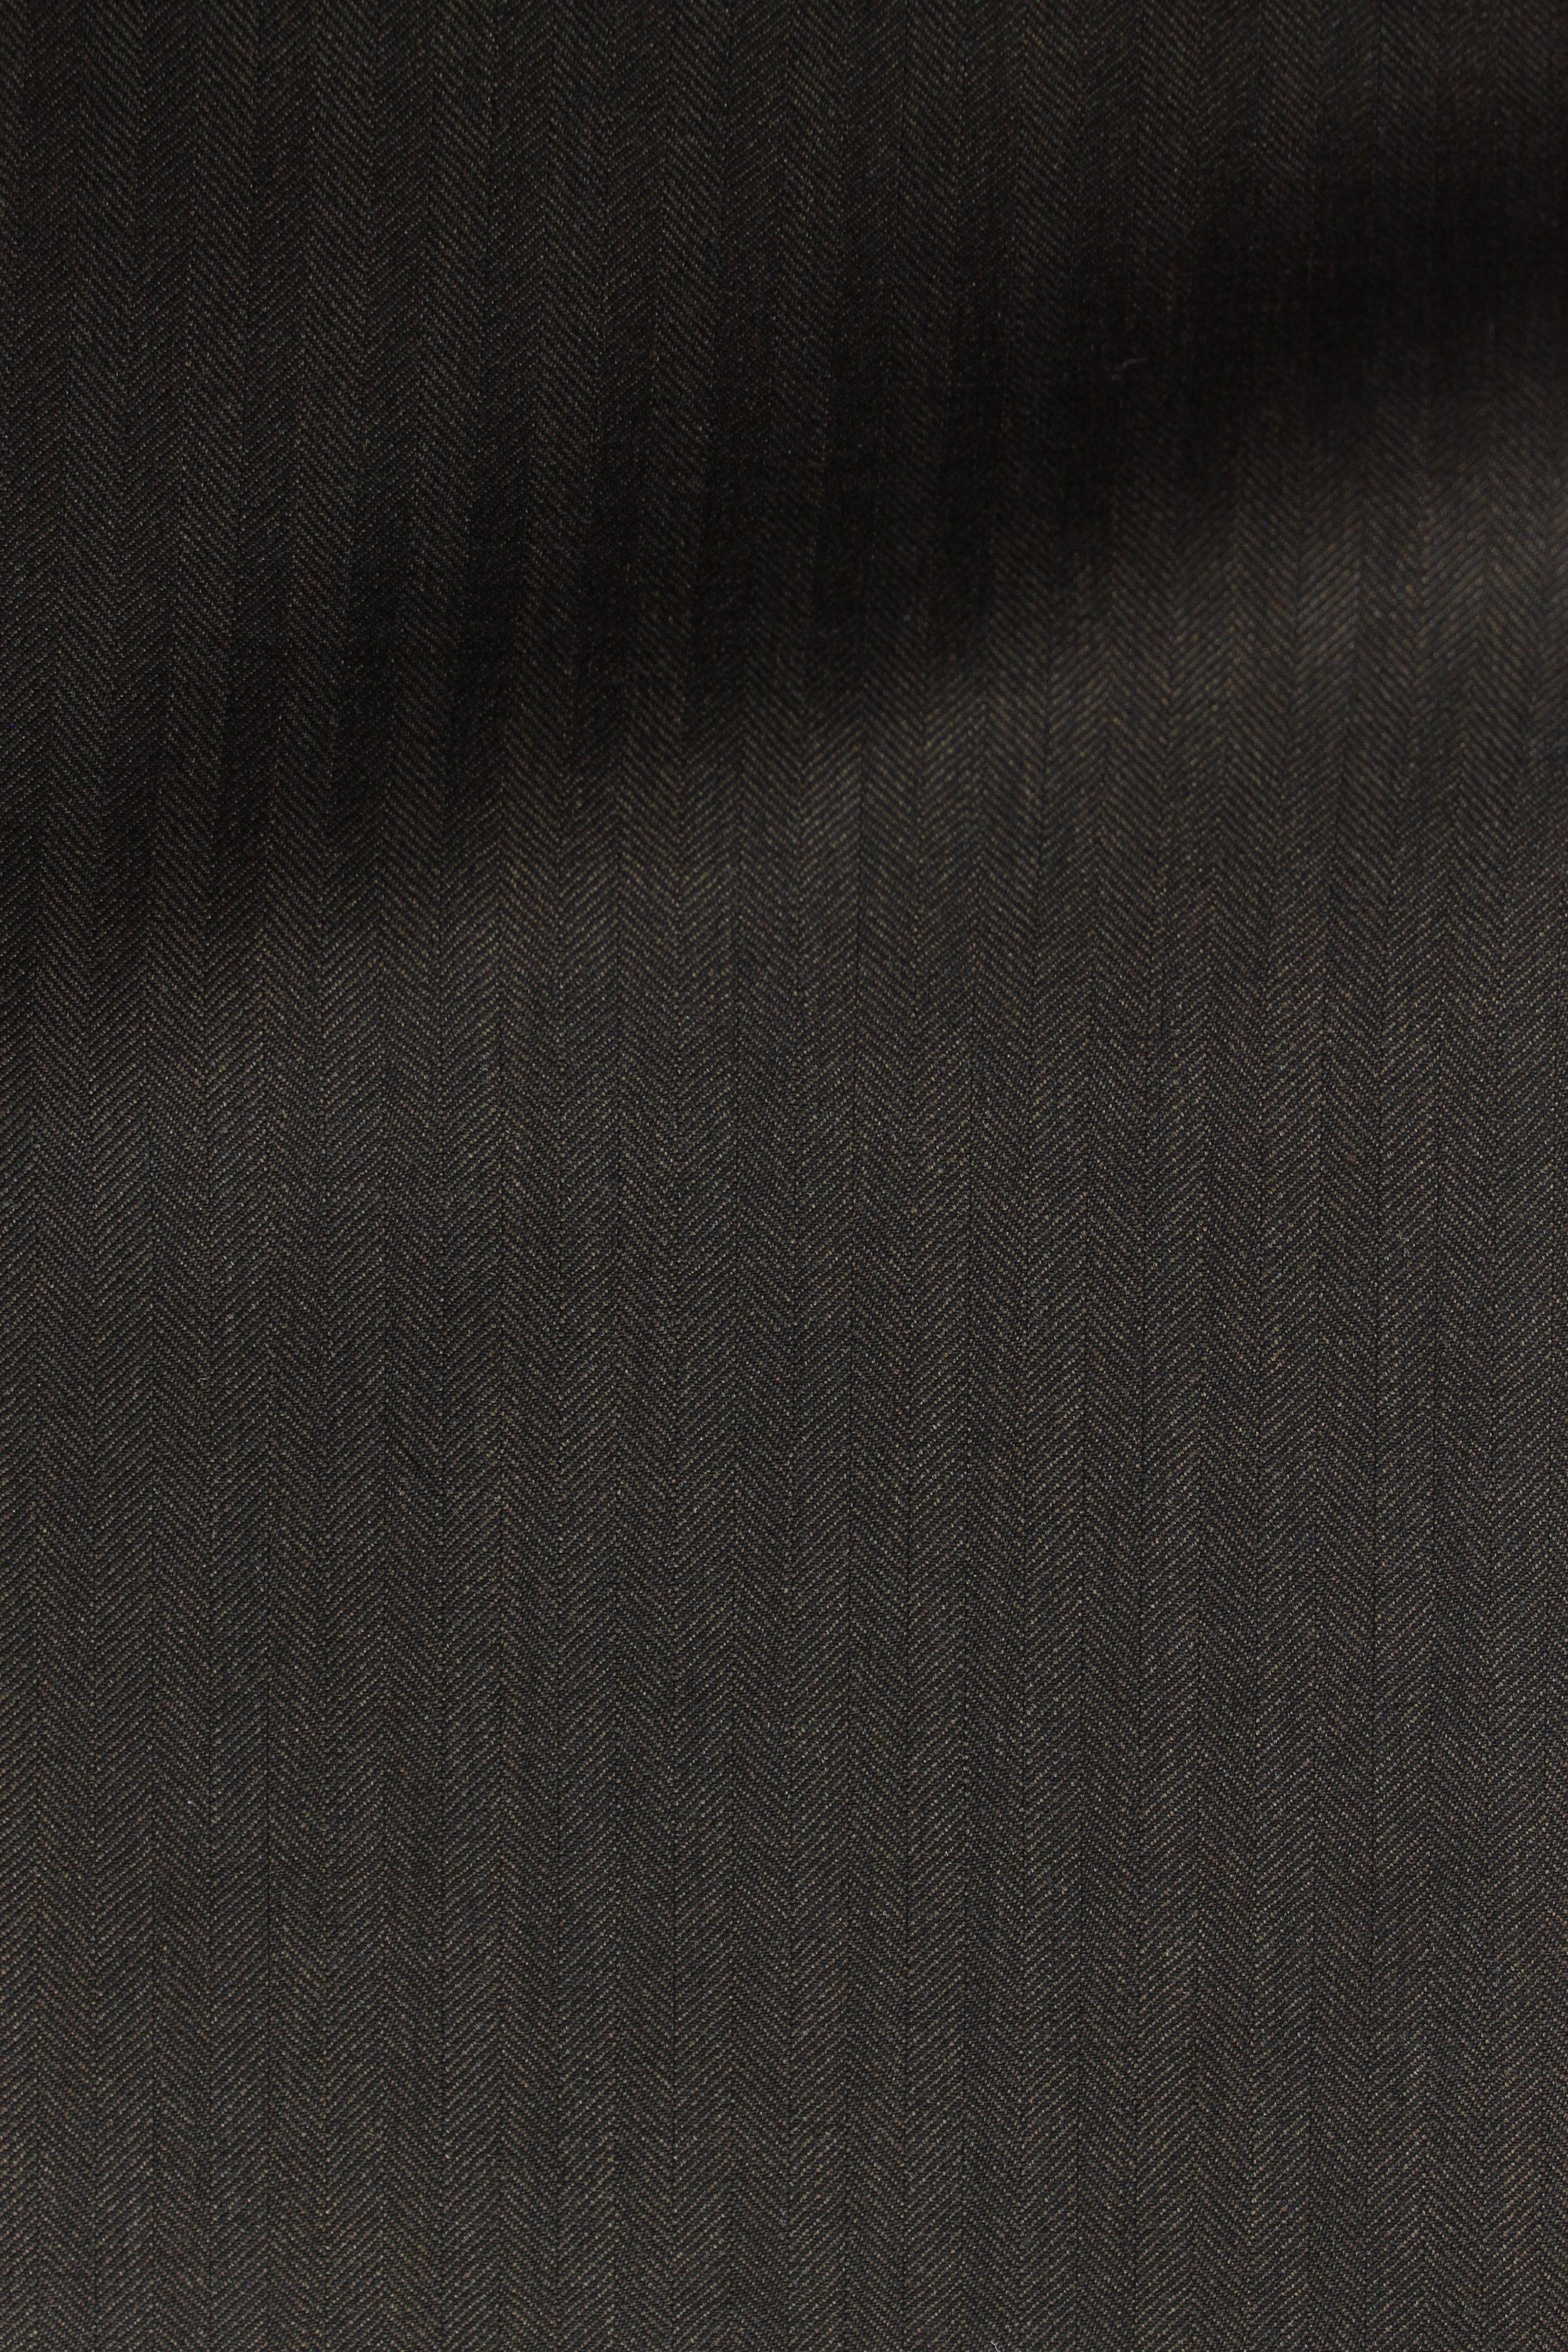 7582 Chestnut Brown Herringbone 270g.JPG